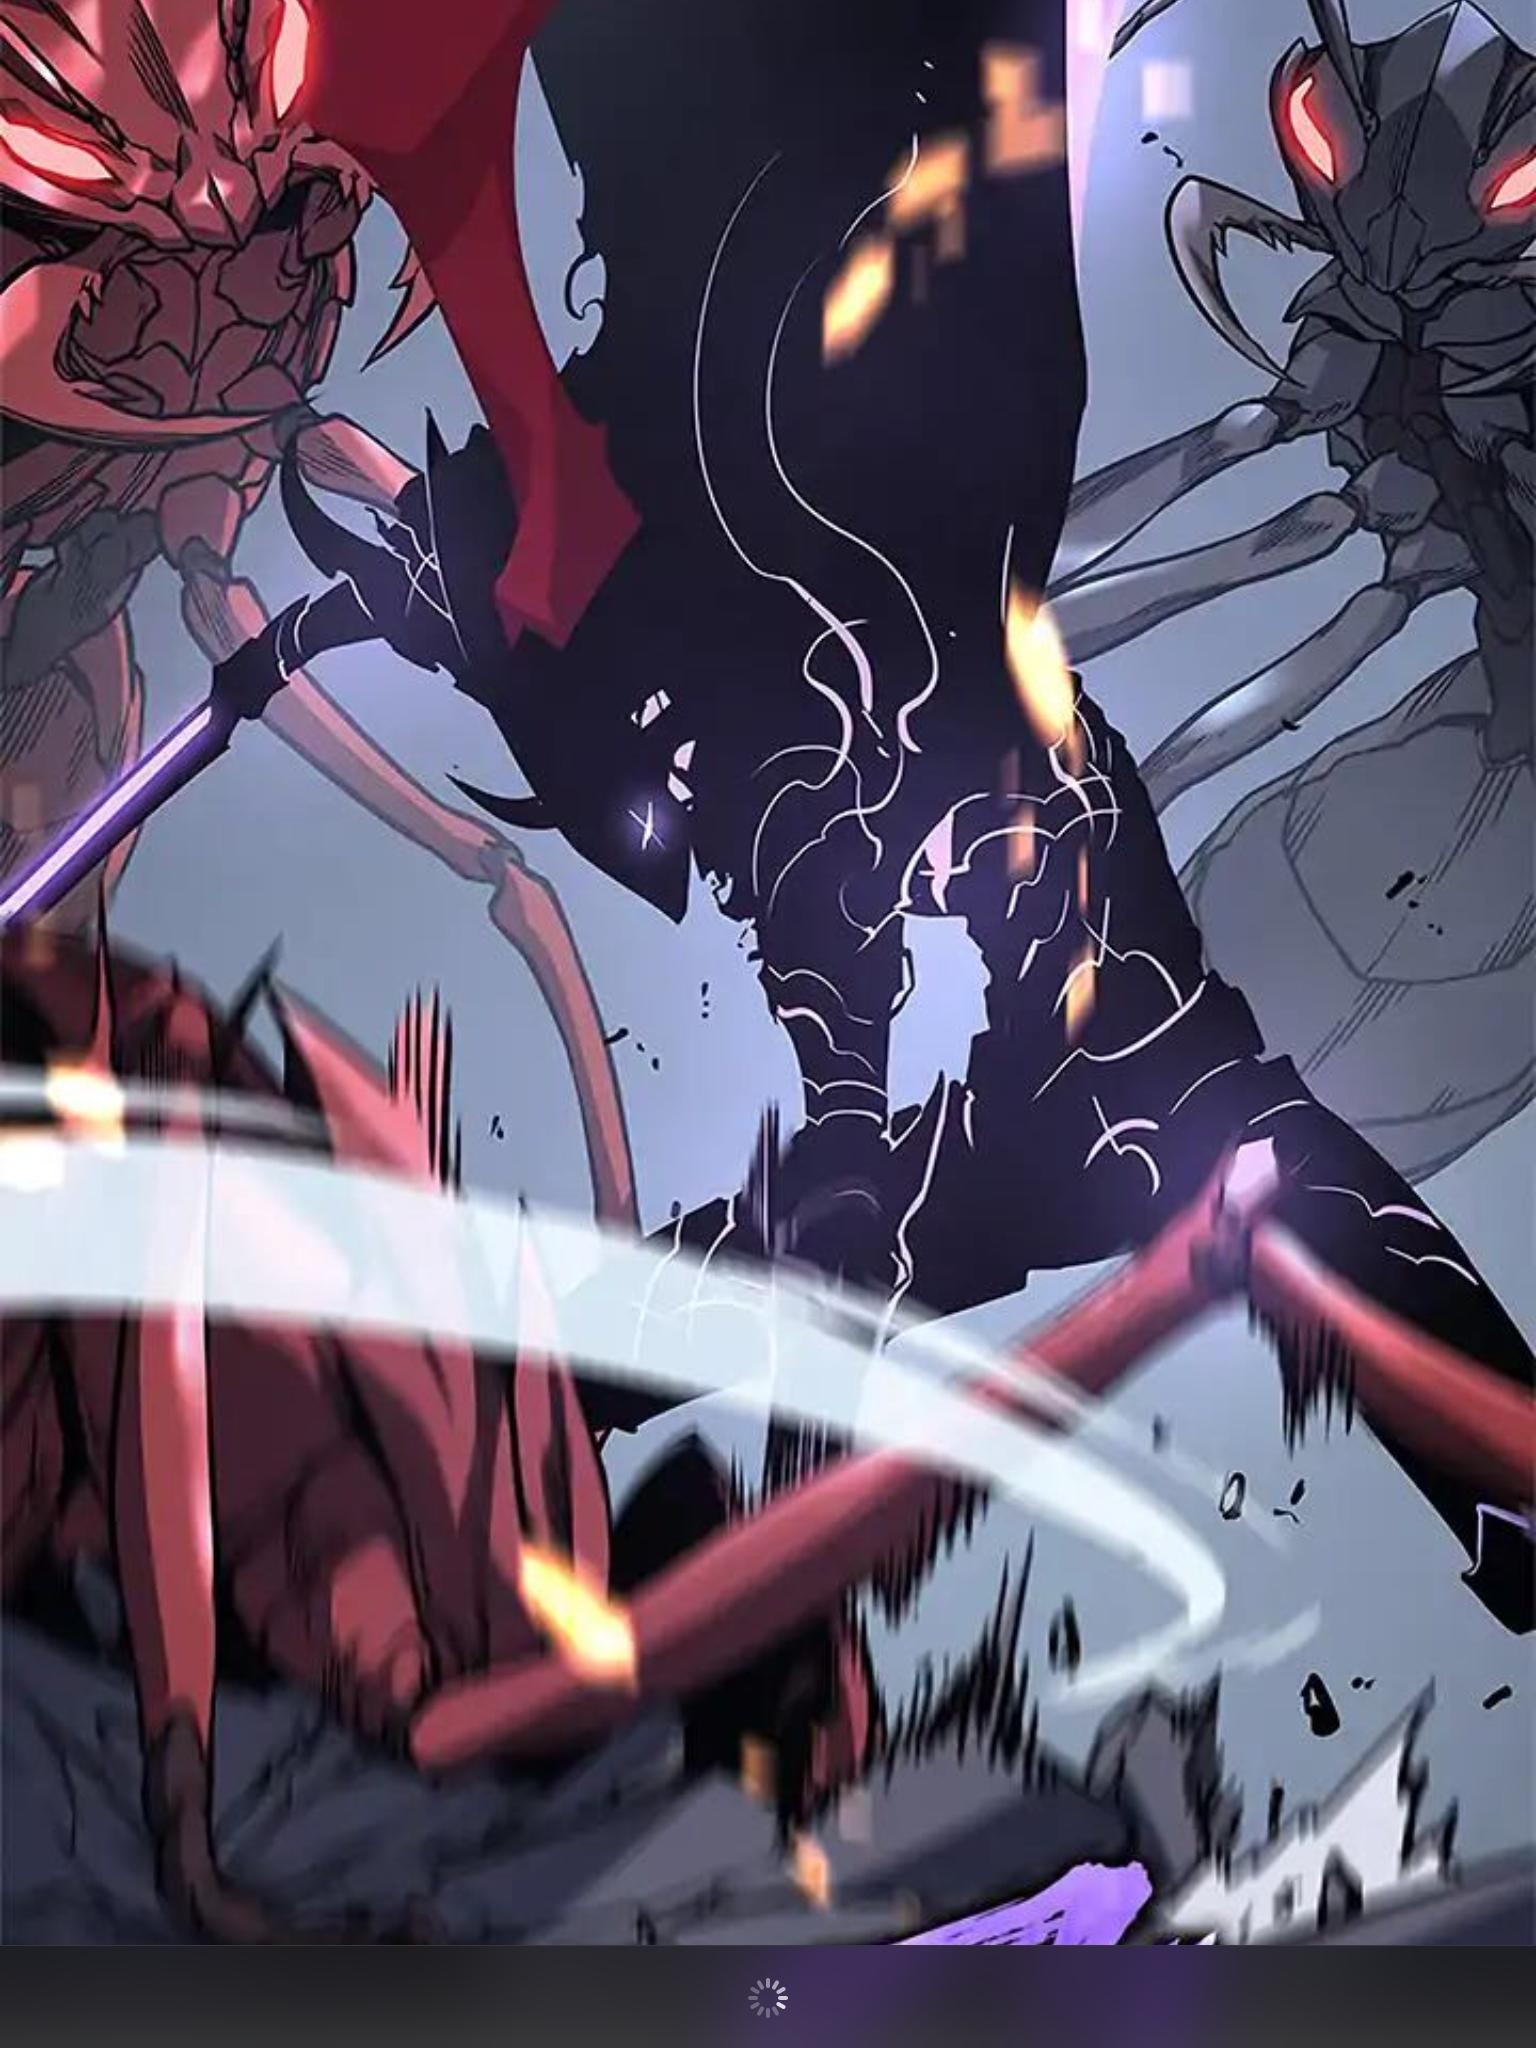 Pin by Mrfirstar on RPG Stuff in 2020 Dark fantasy art